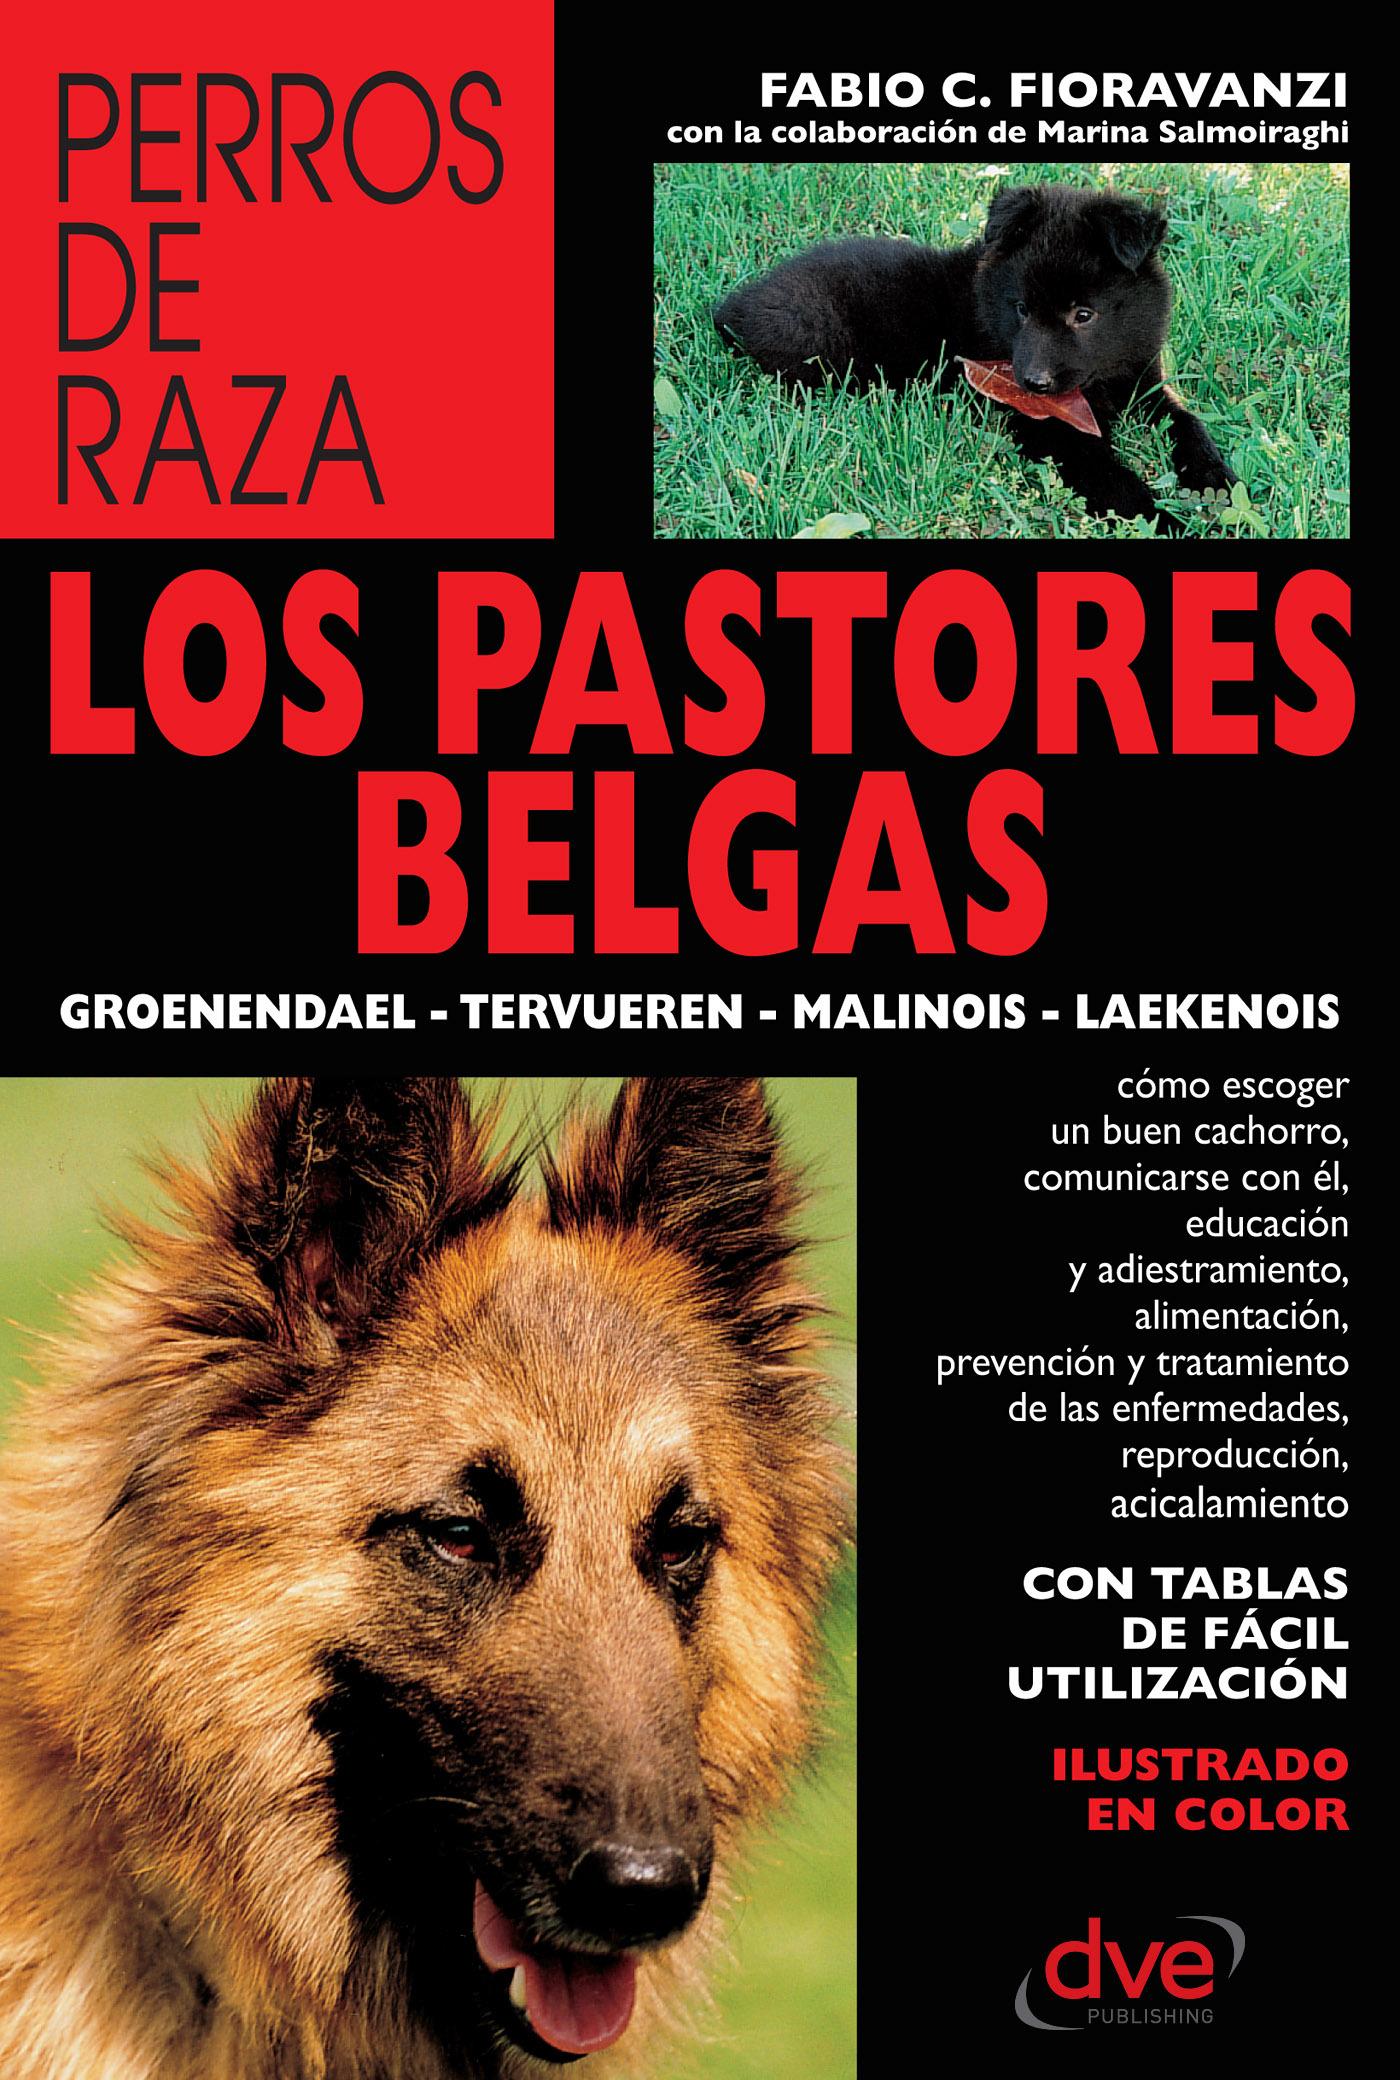 Fioravanzi, Fabio C. - Los pastores belgas: Groenendael - Tervueren - Malinois - Laekenois, ebook